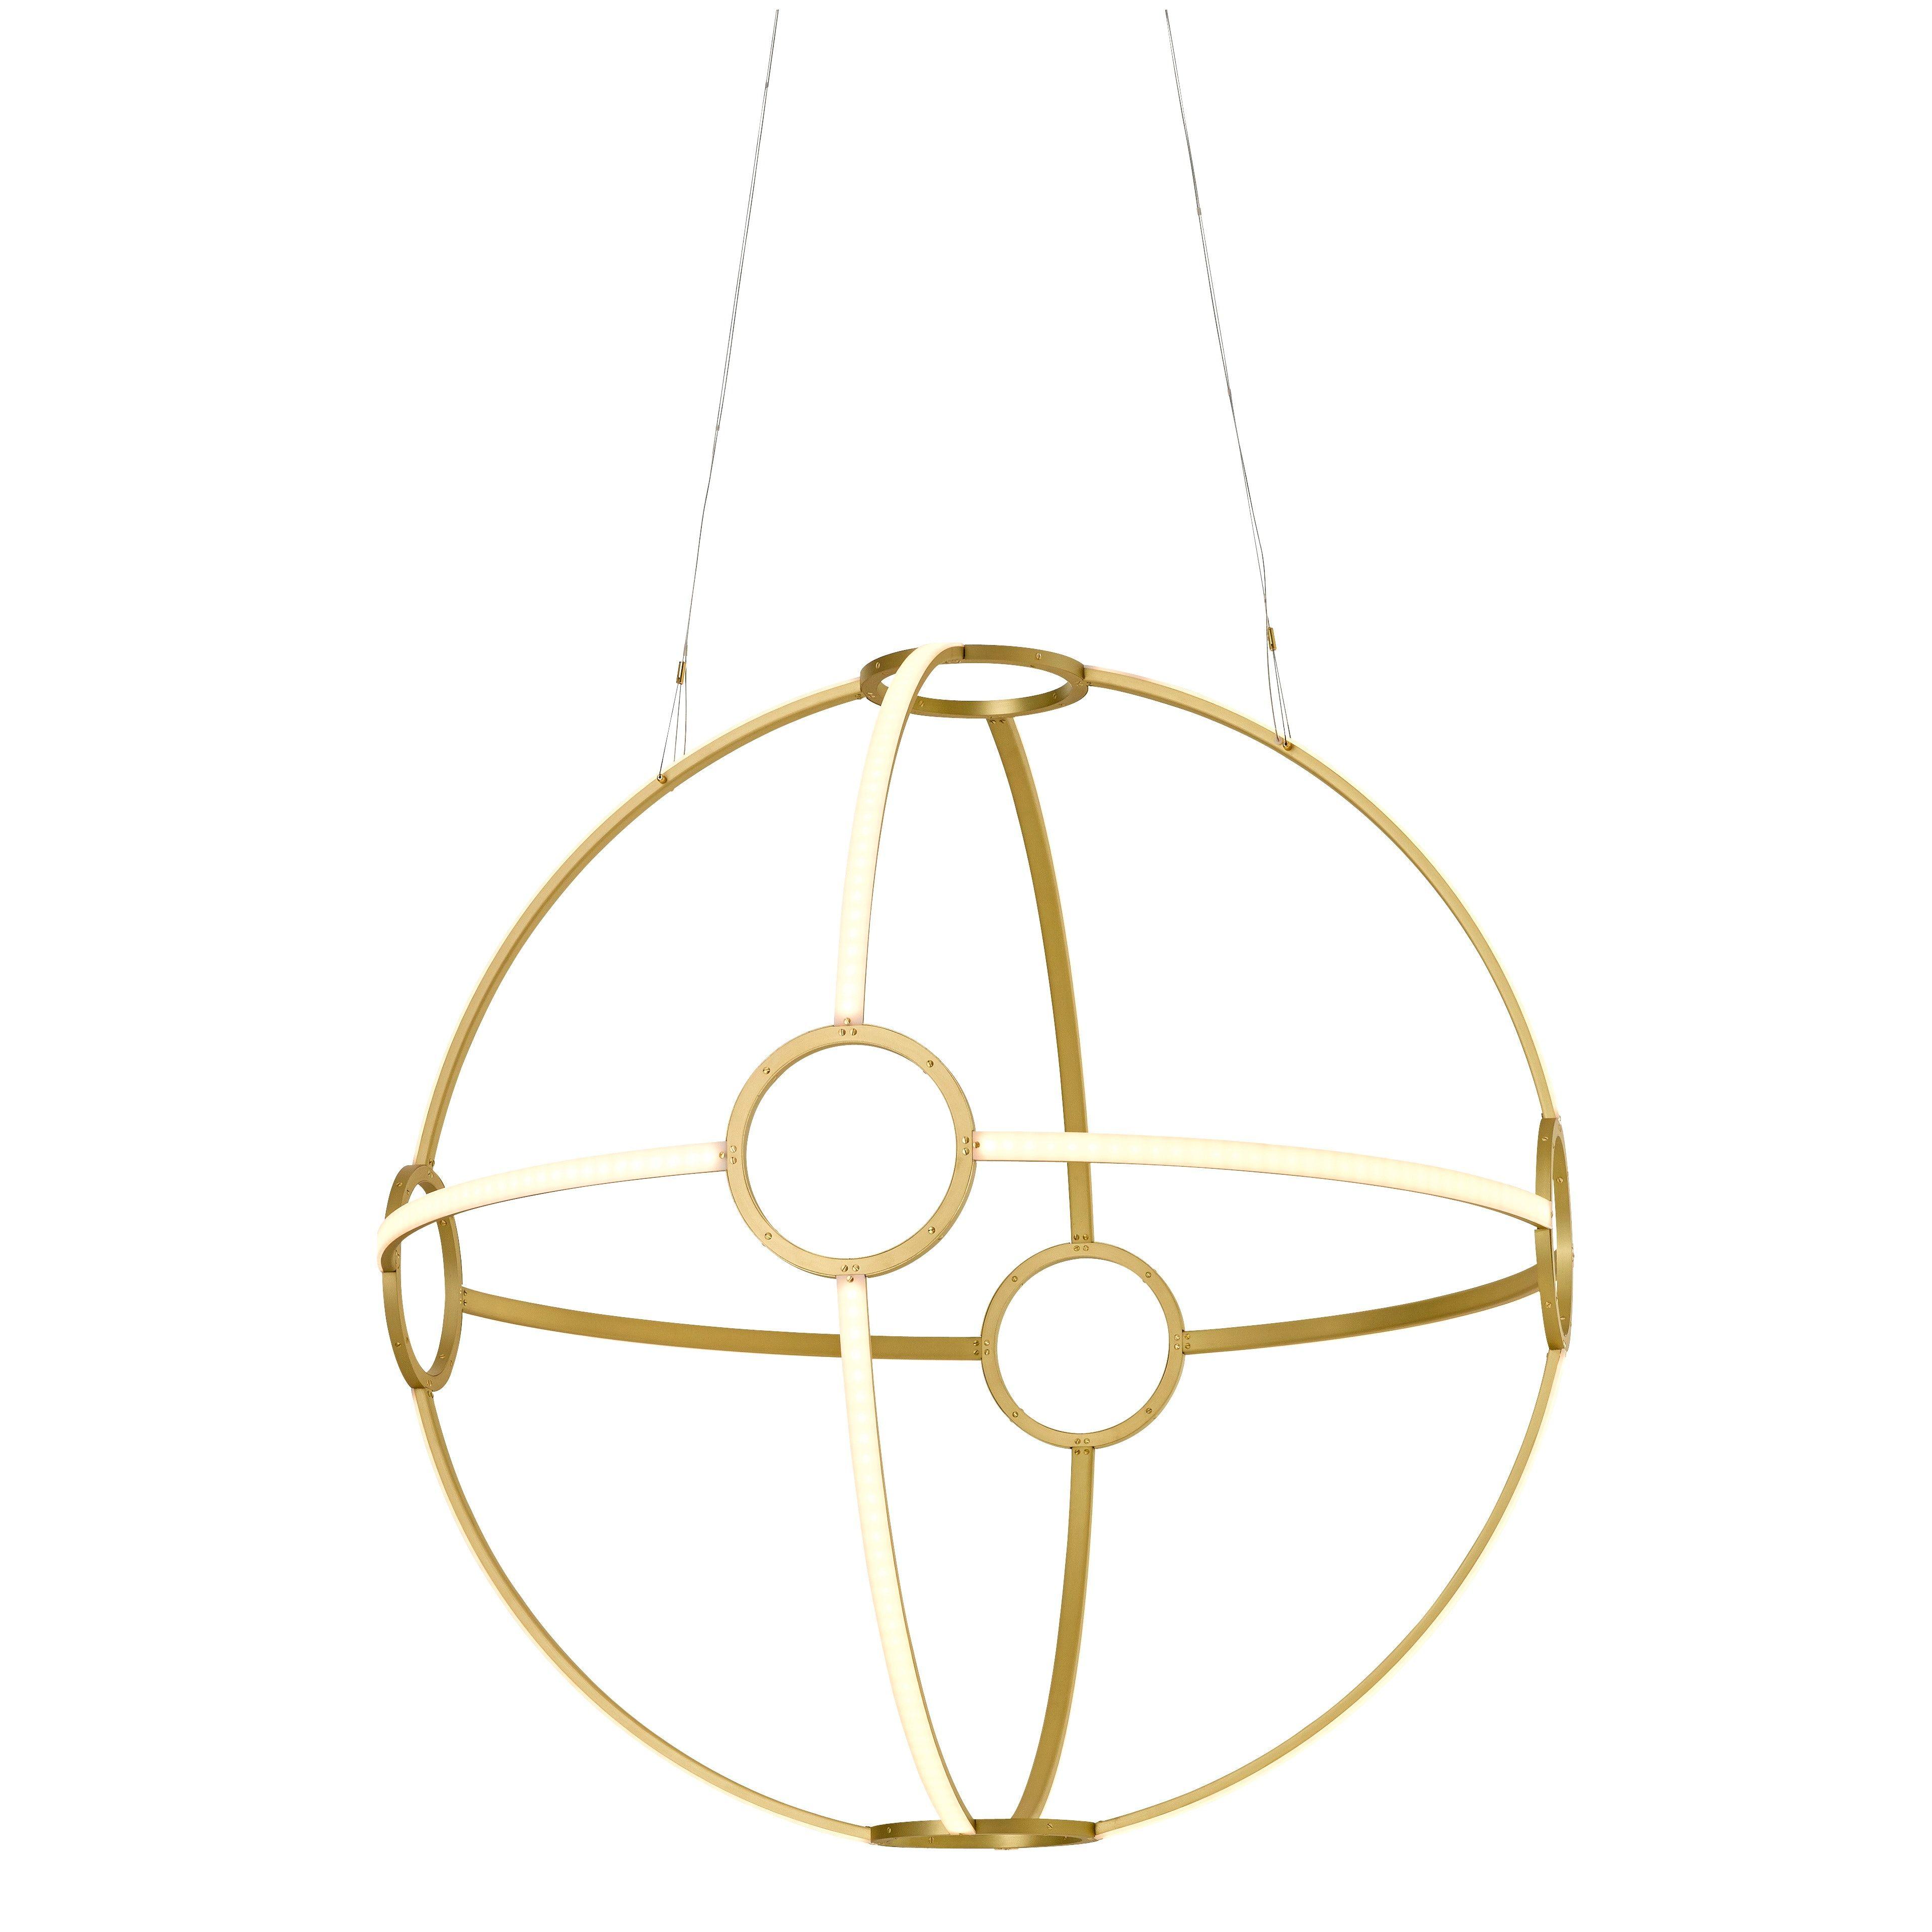 designers giorgione giove design furniture black lighting contemporary ital